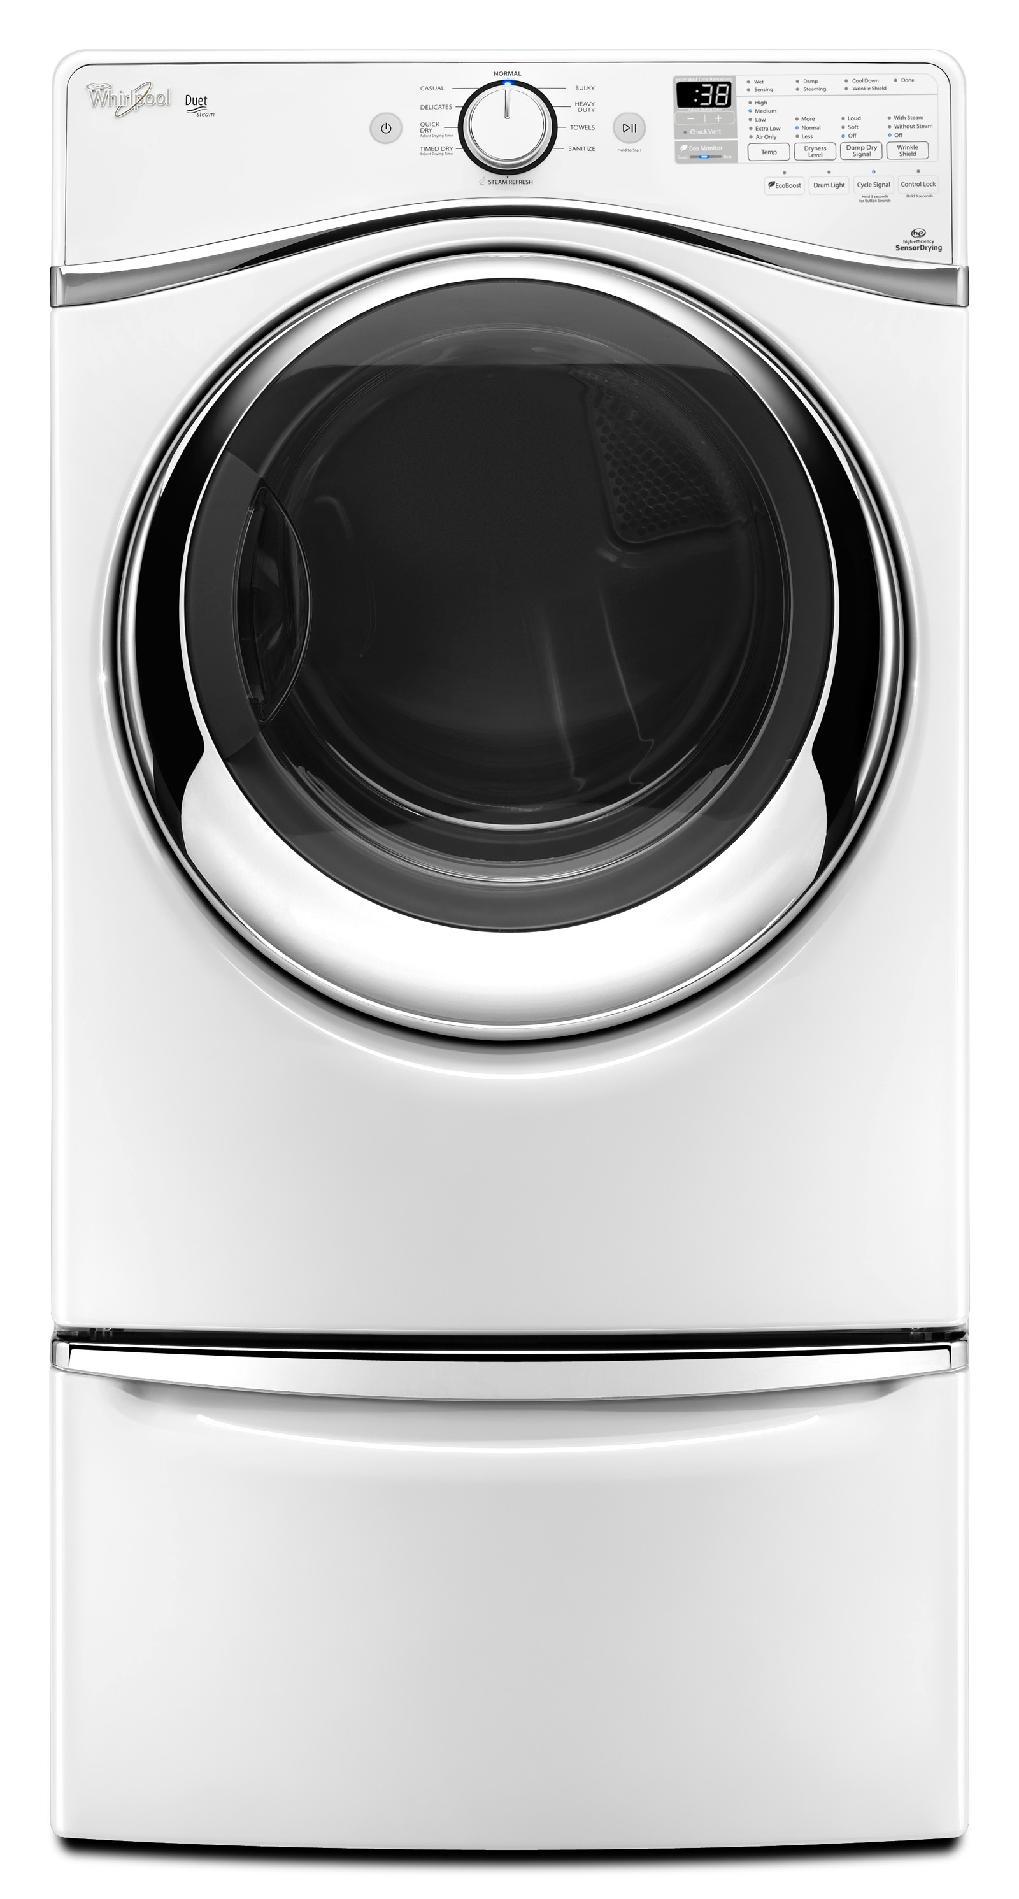 Whirlpool WGD95HEDW 7.4 cu. ft. Duet® Gas Dryer w/ Stainless Steel Drum - White WGD95HEDW